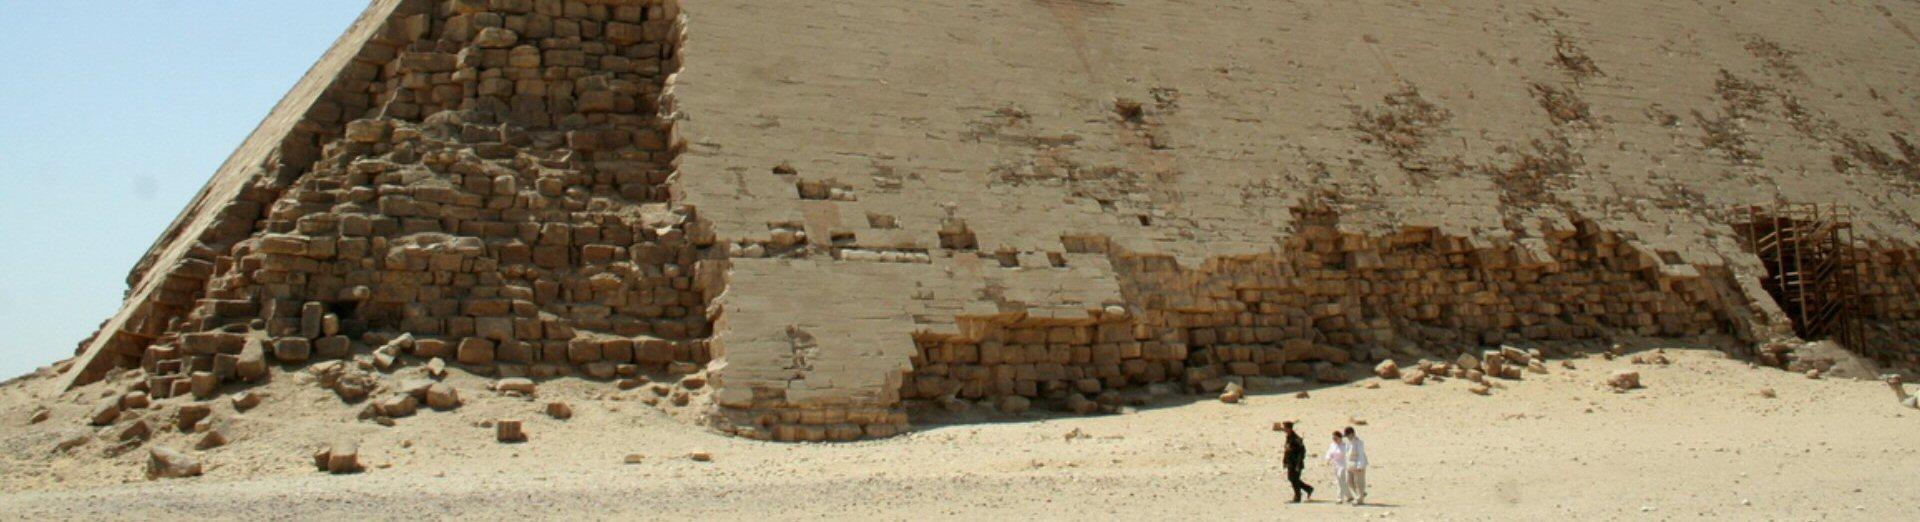 90-archeoastronomia_inca_slid_1